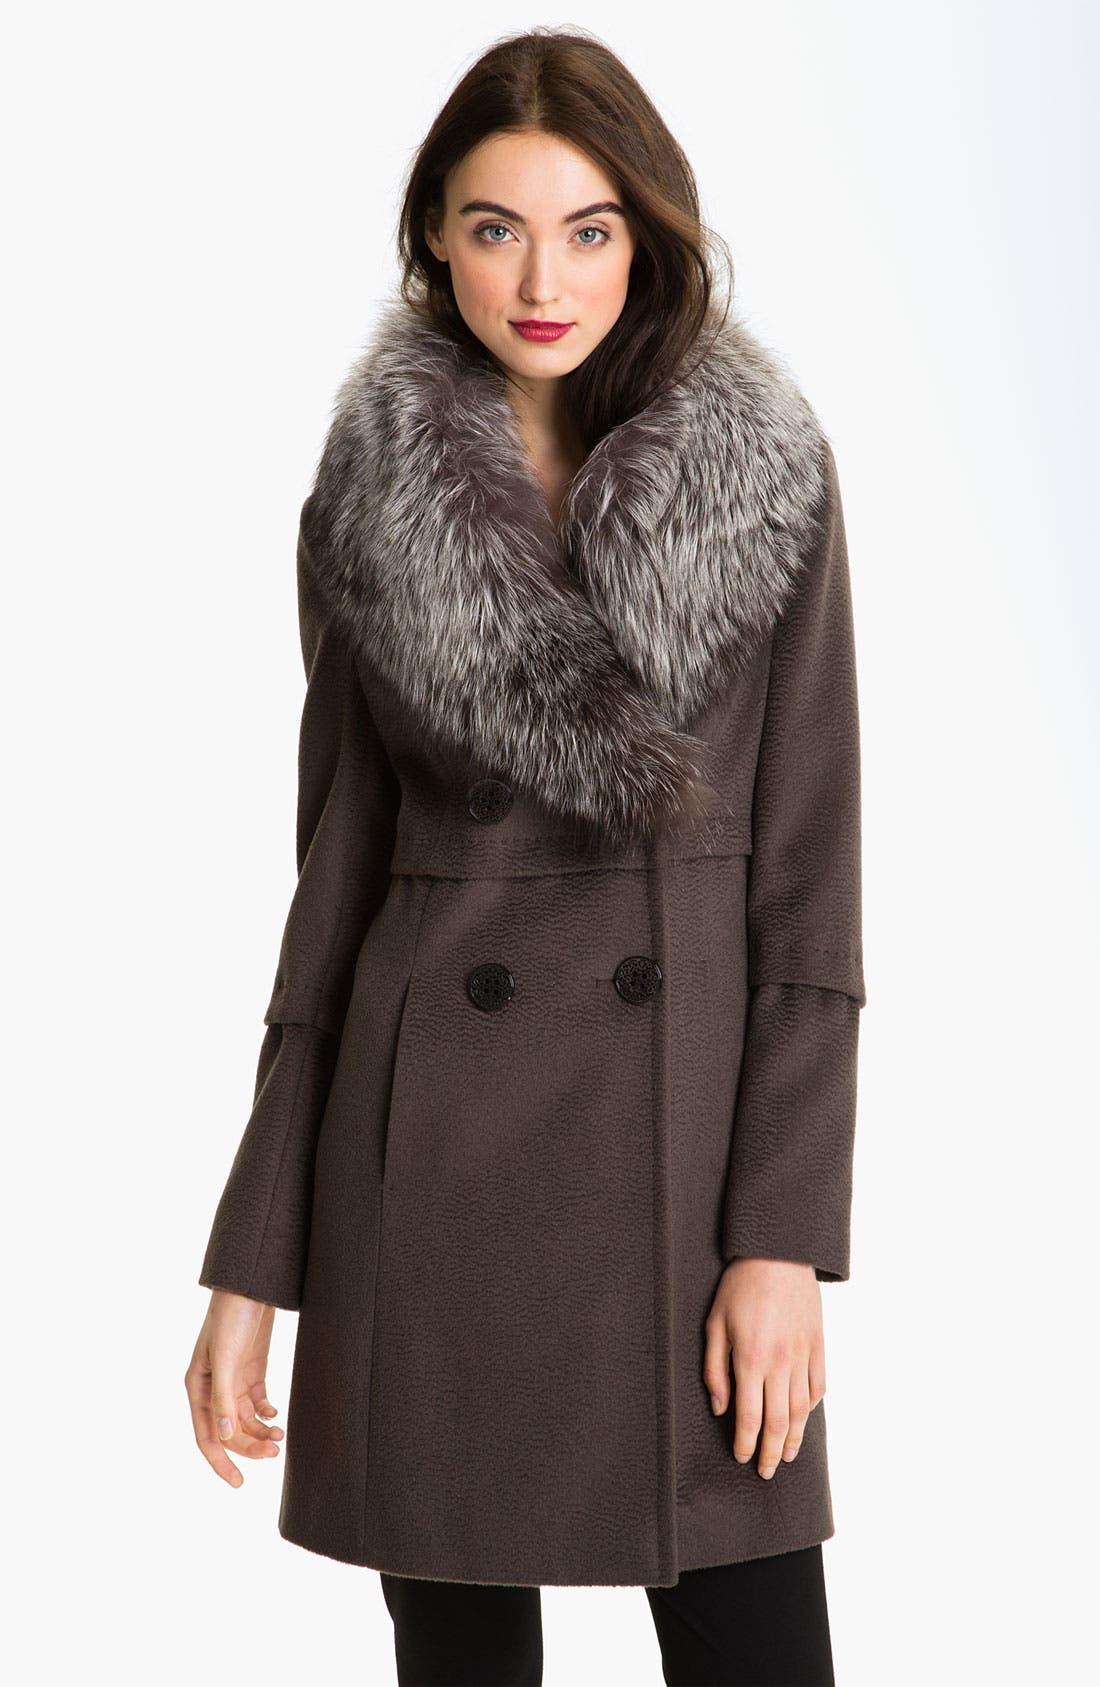 Main Image - Elie Tahari Double Breasted Coat with Genuine Fox Fur Collar